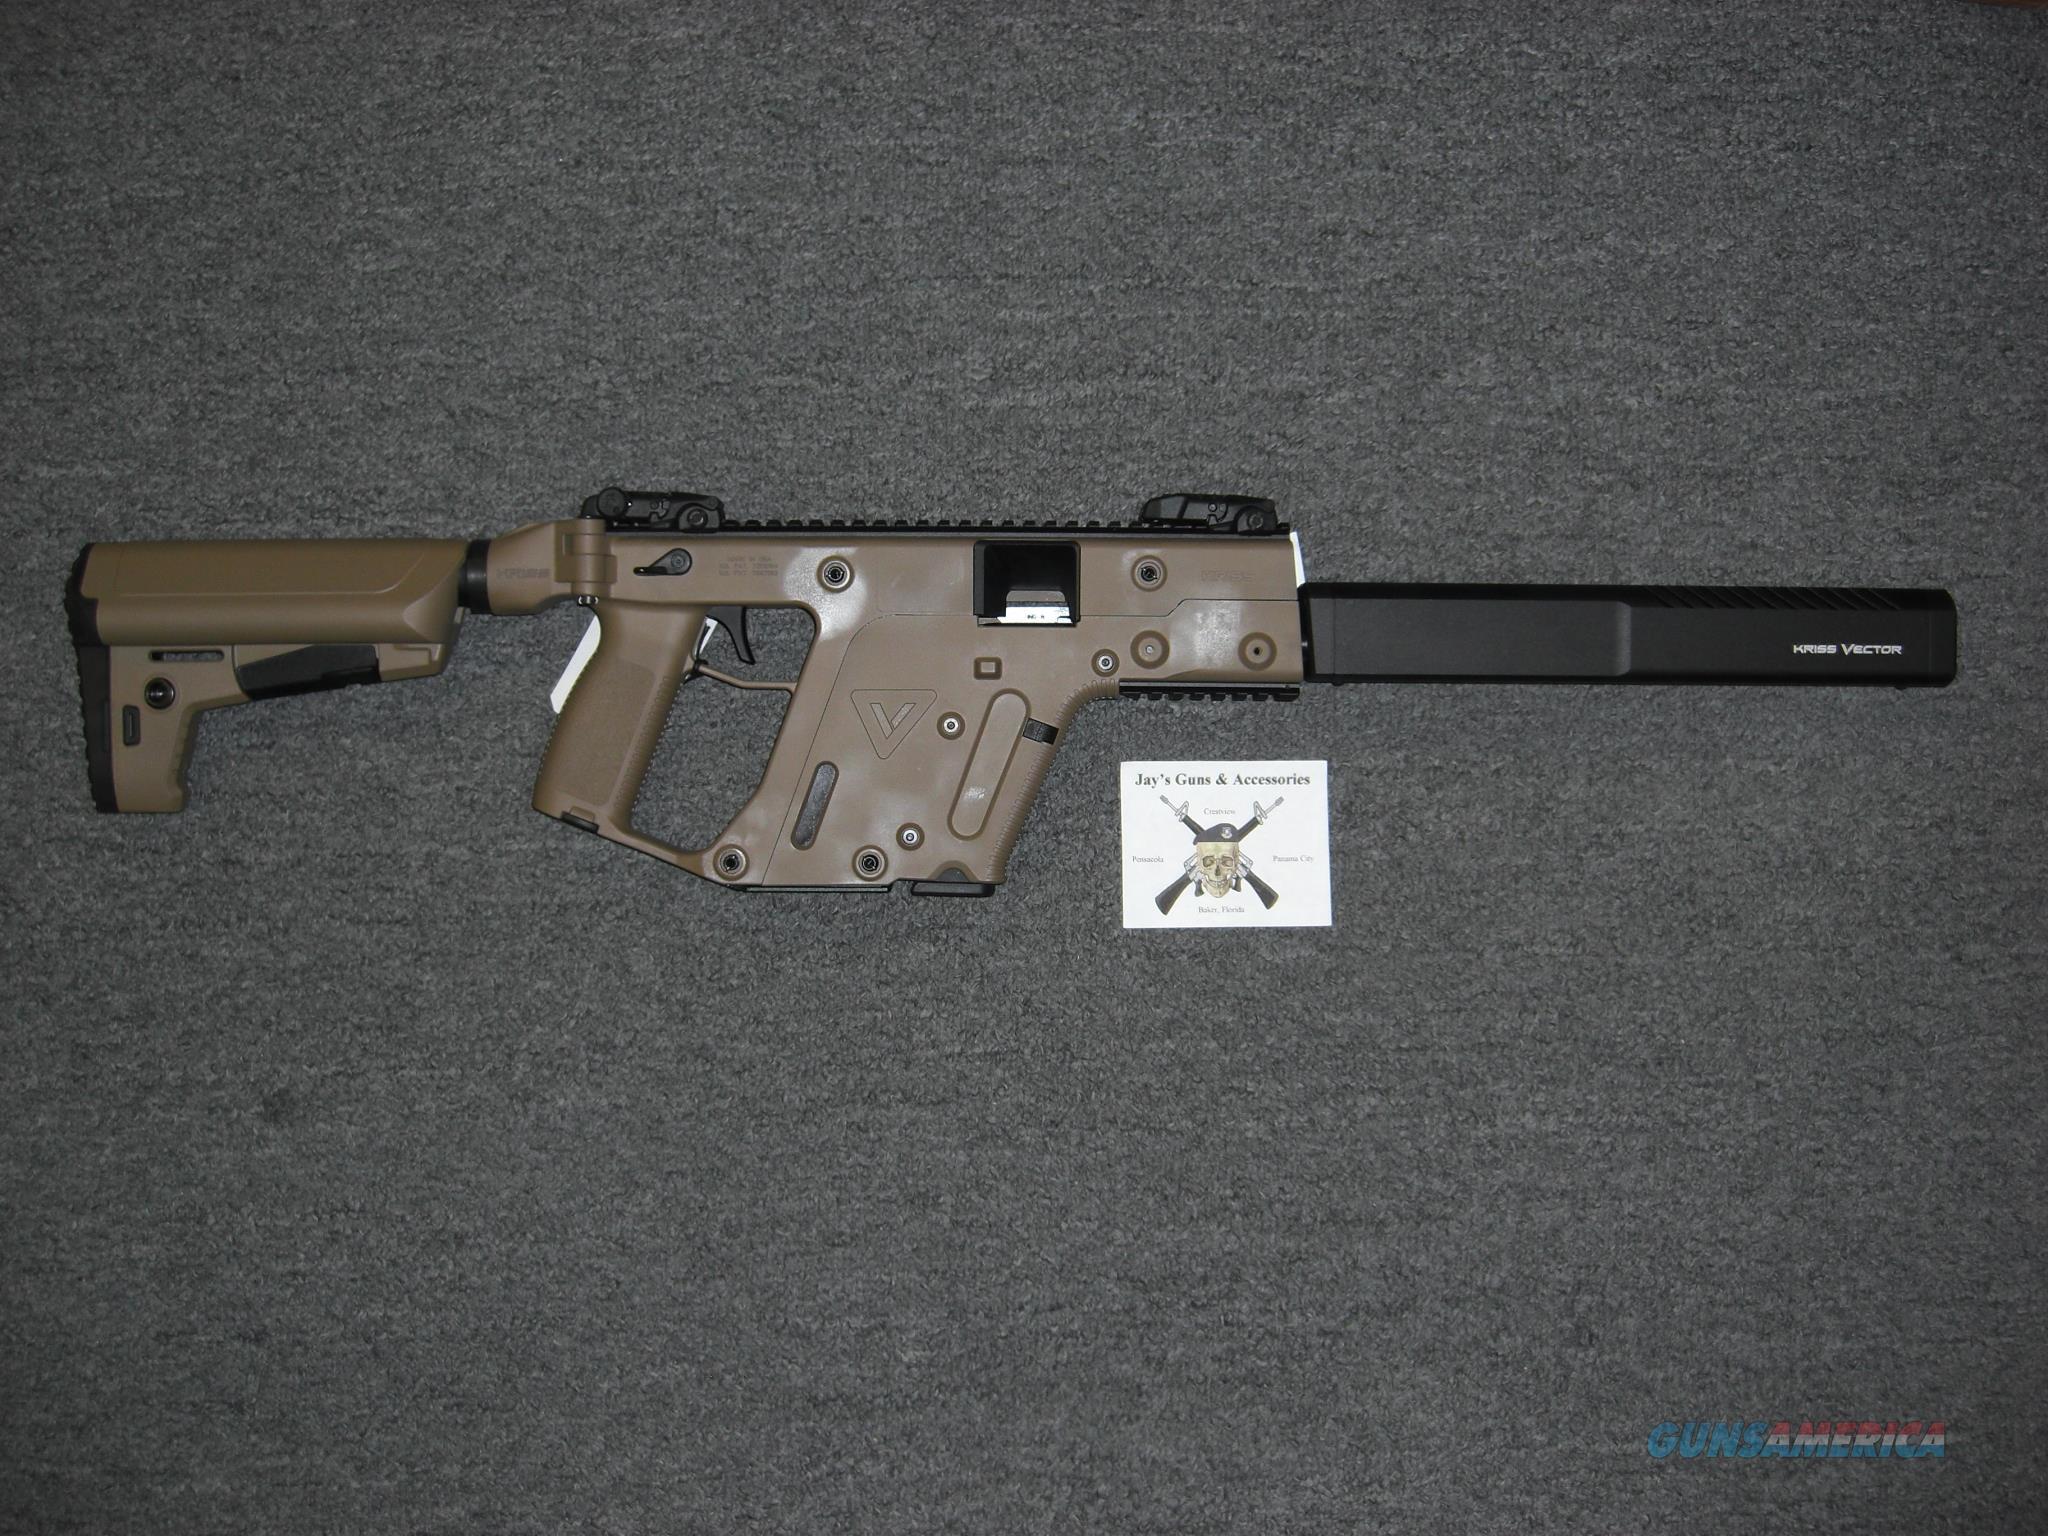 jpg transparent download Vector carbine 23 glock. Kriss crb gen w.